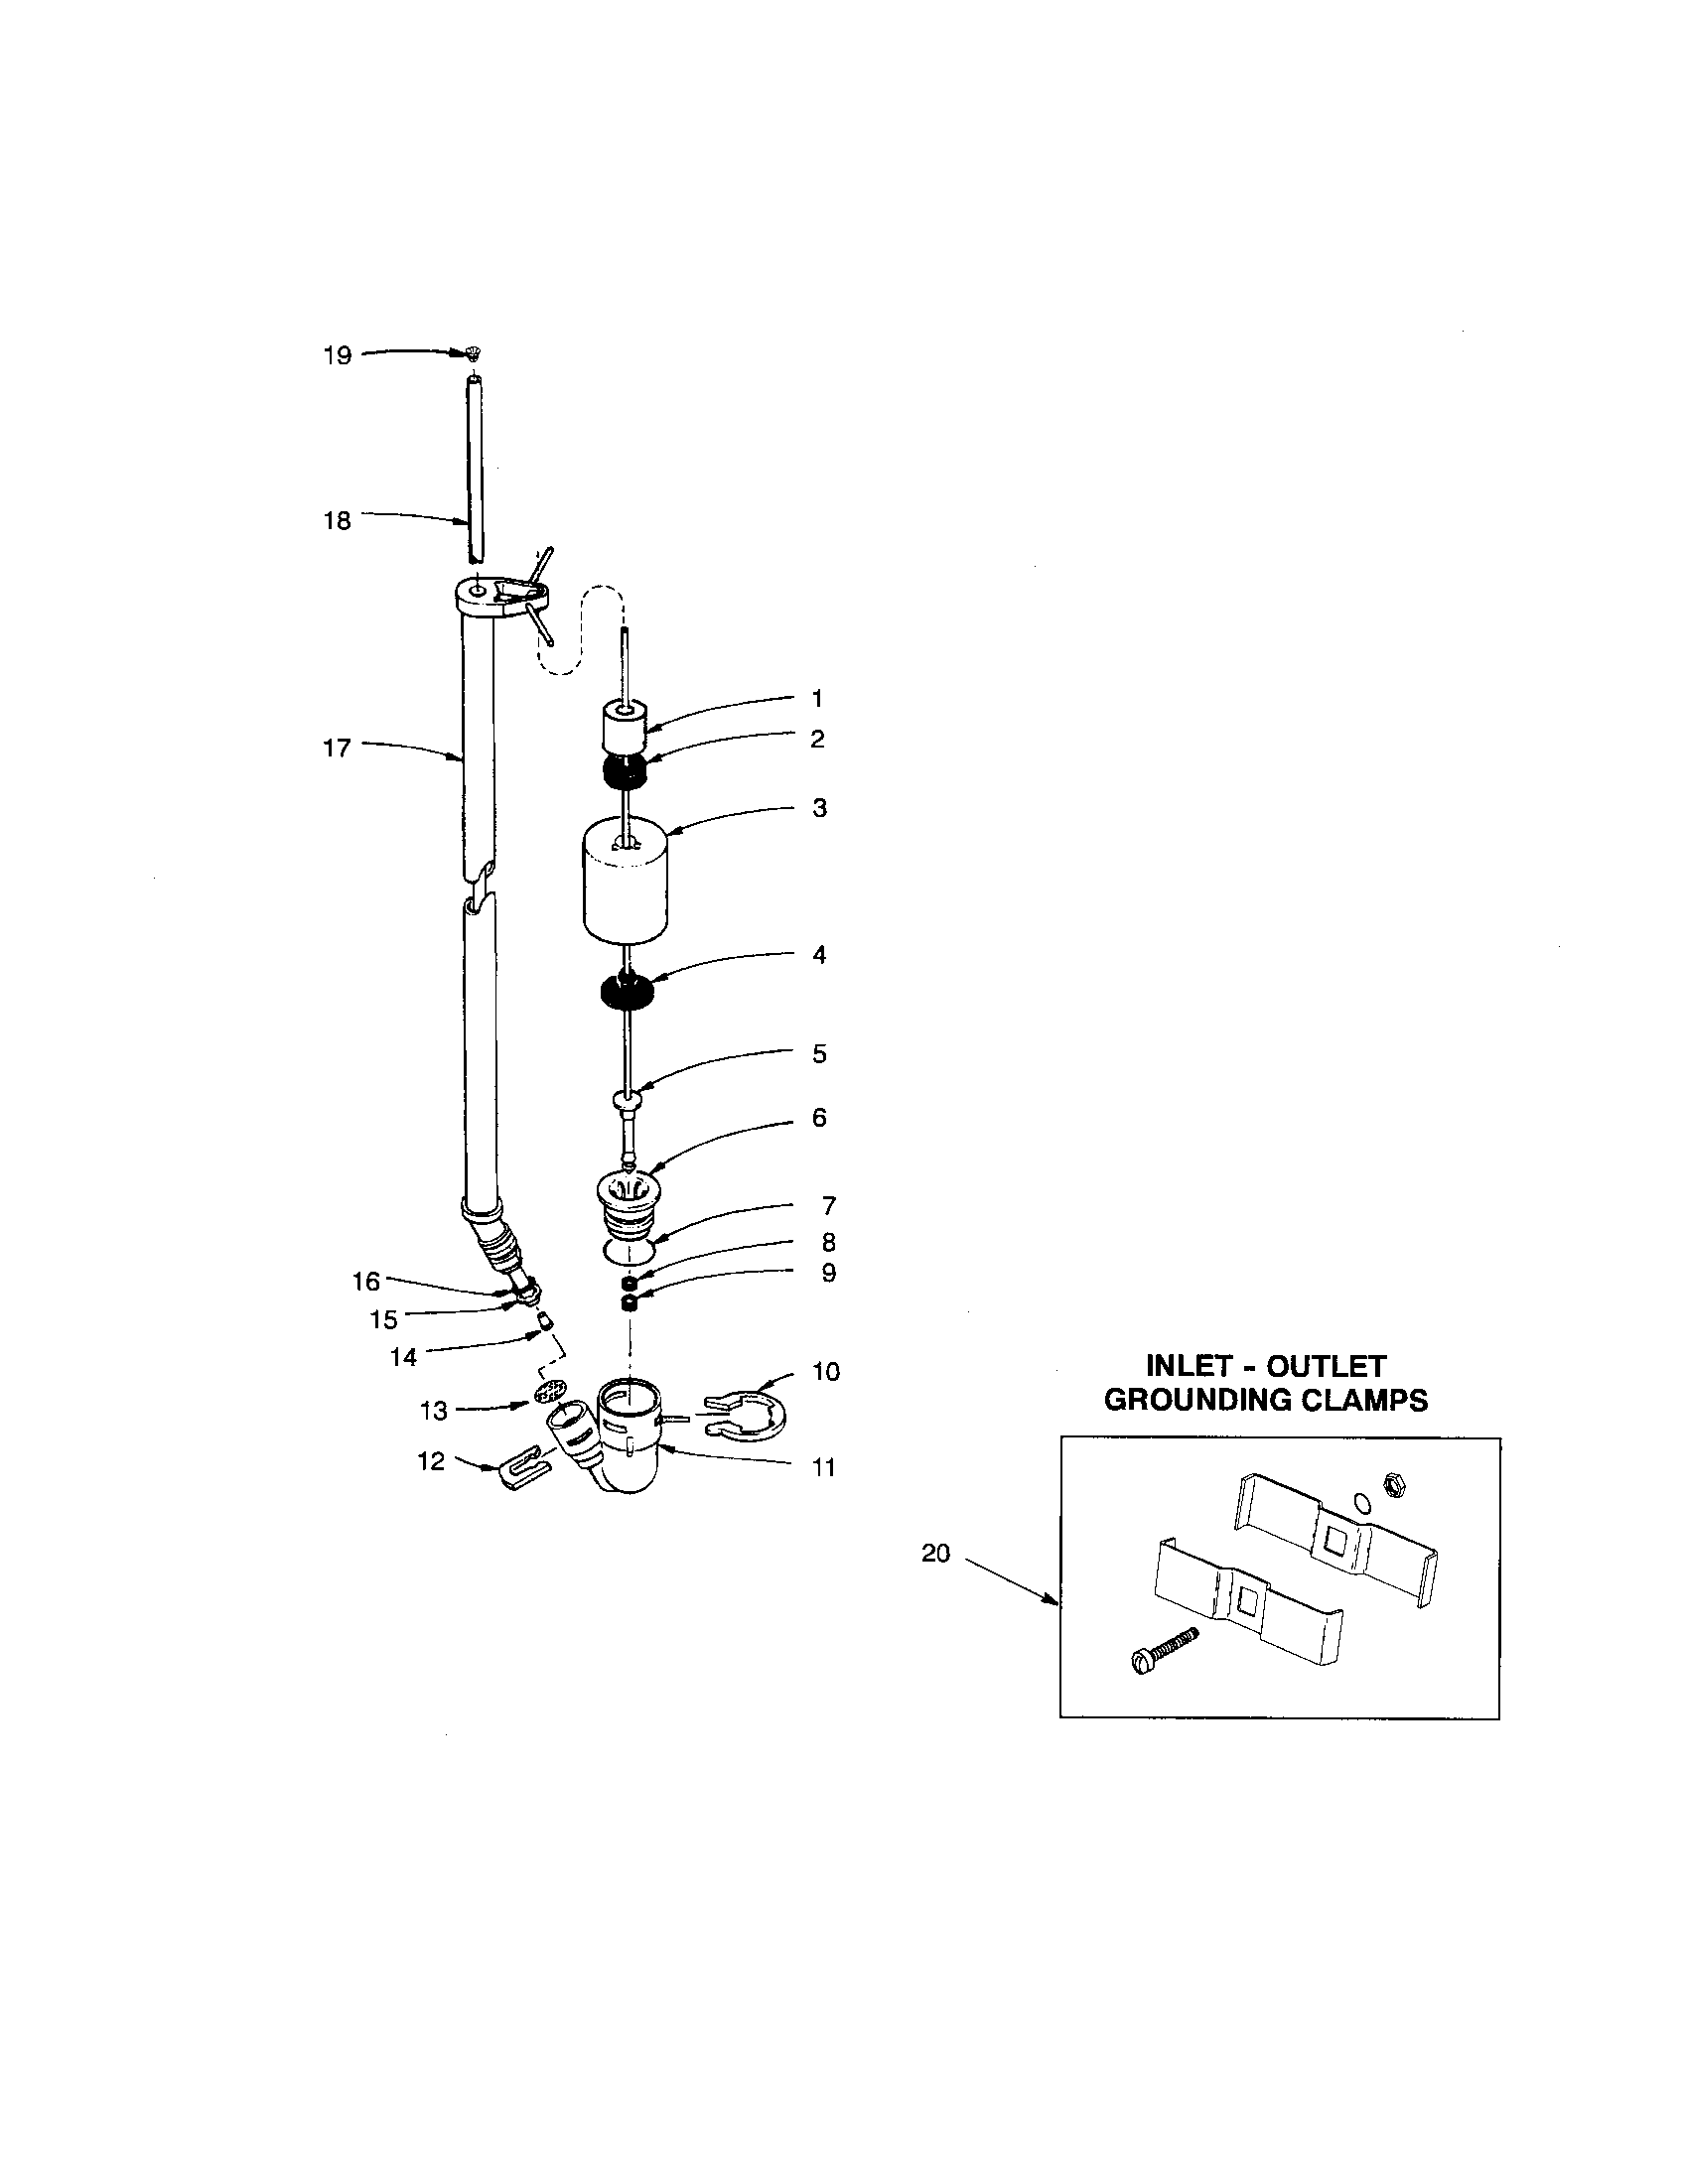 complete brine valve assembly